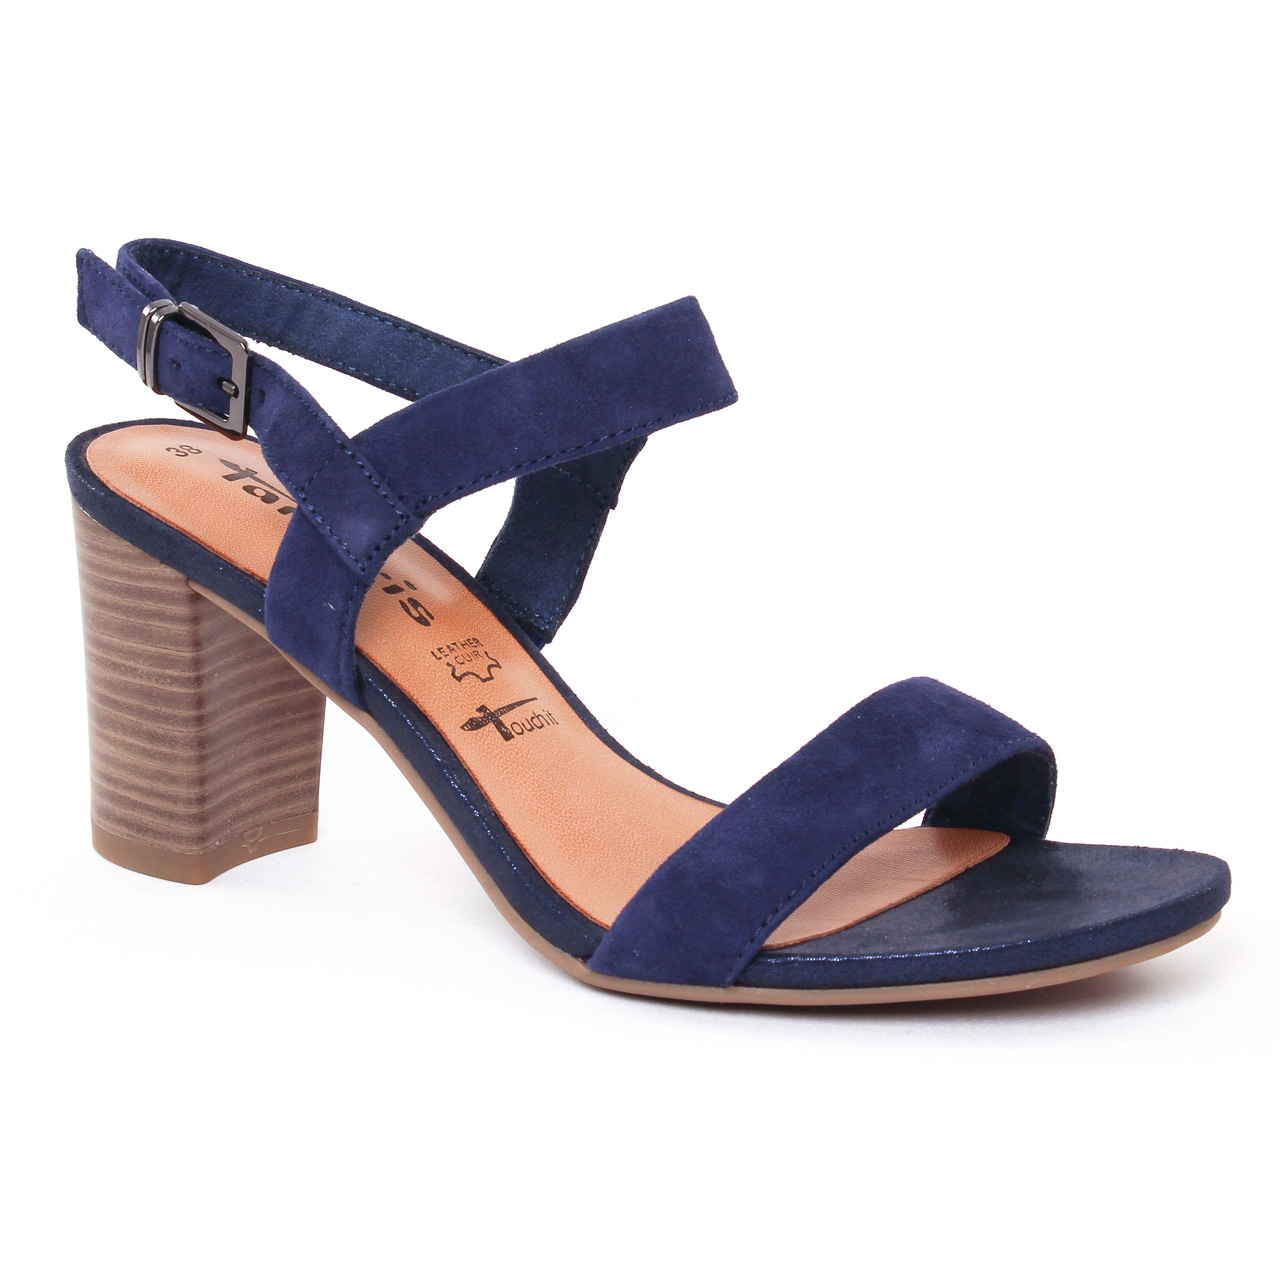 aca256e4cde nu-pieds talons hauts bleu marine mode femme printemps été vue 1